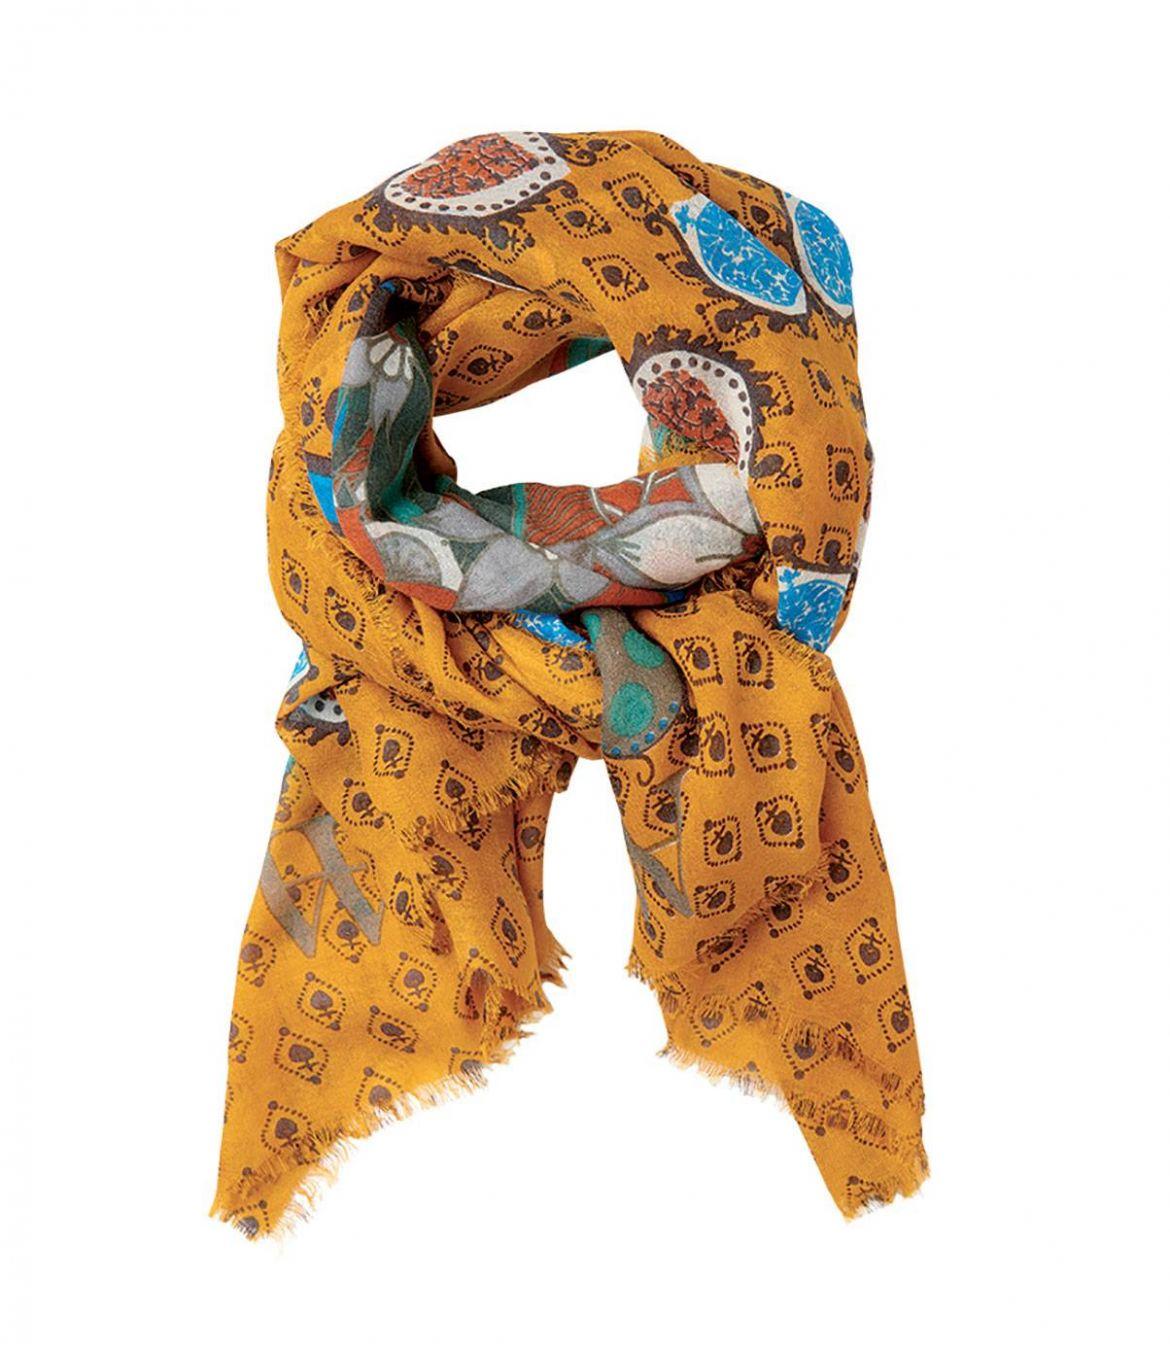 ADDICT Women's Wool Scarf 100x200 cm Storiatipic - 1